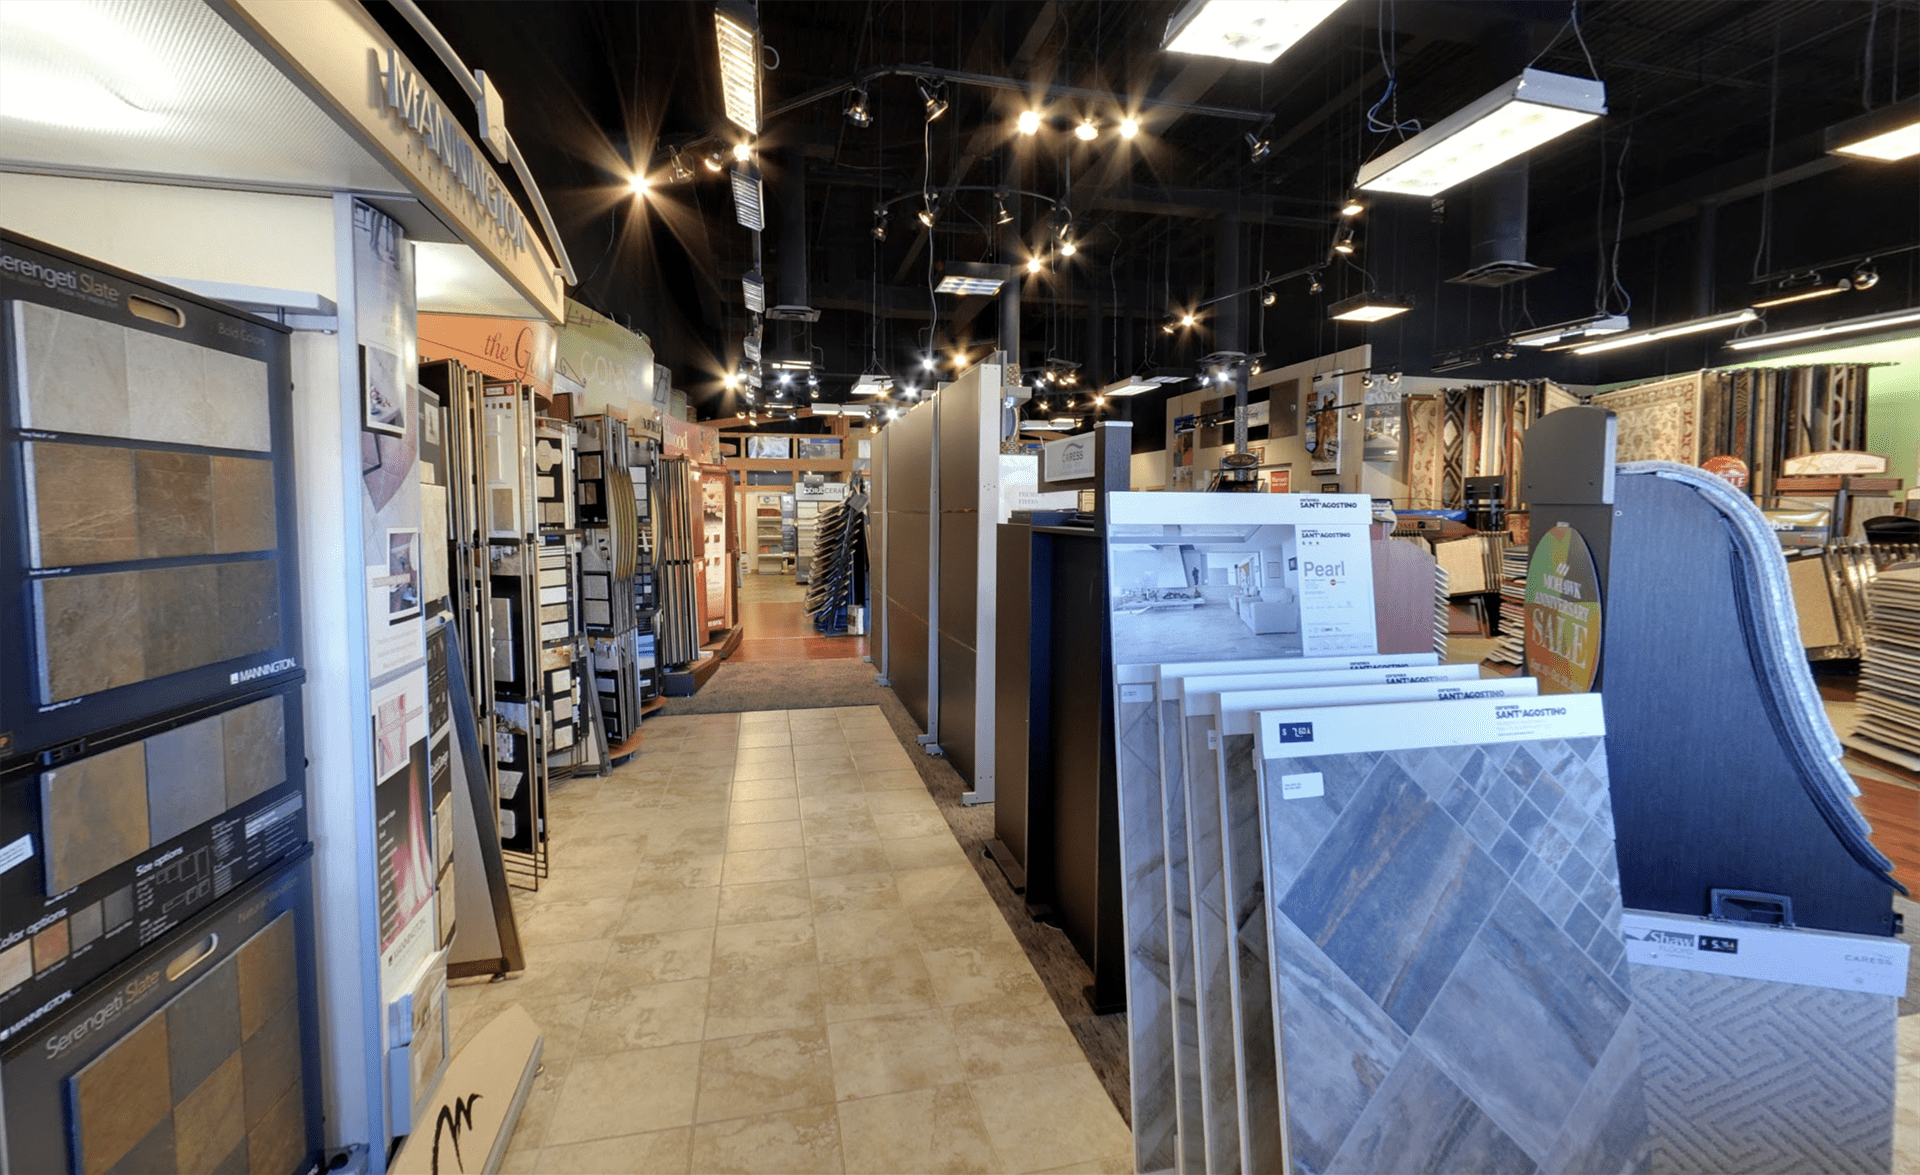 Carpet & Floors Market showroom near Fort Washington, MD